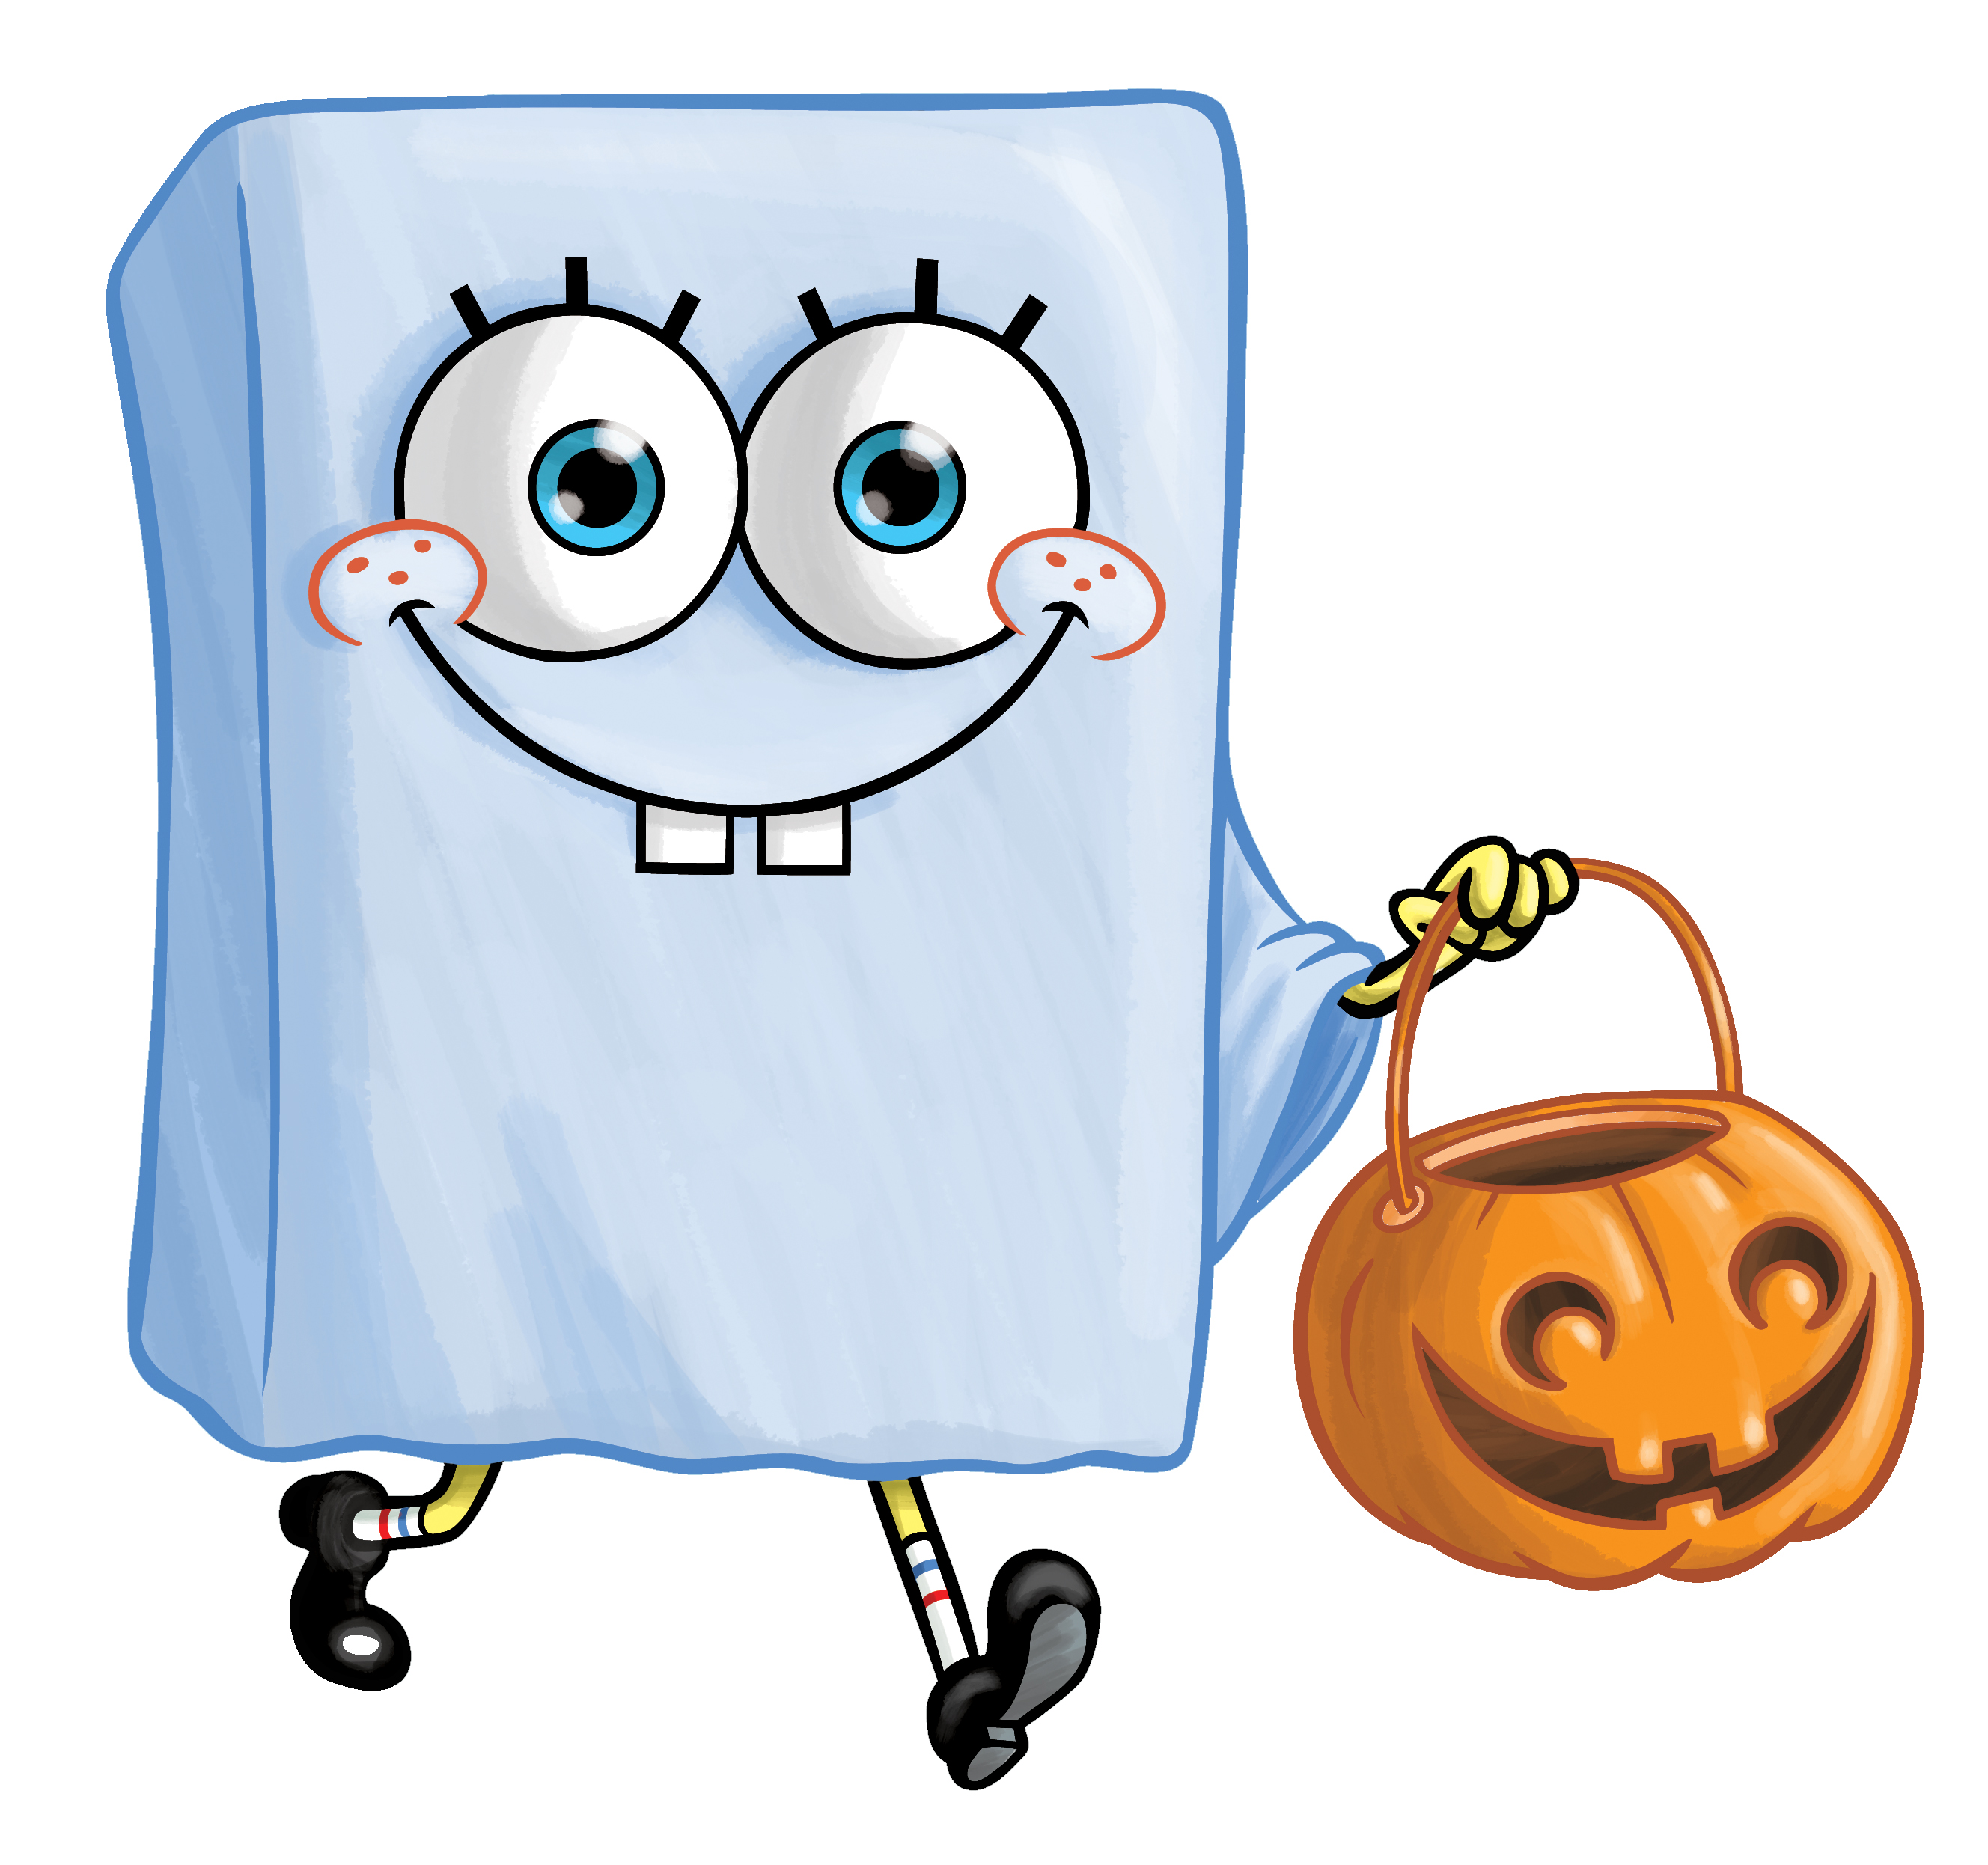 spongebob squarepants image go nh